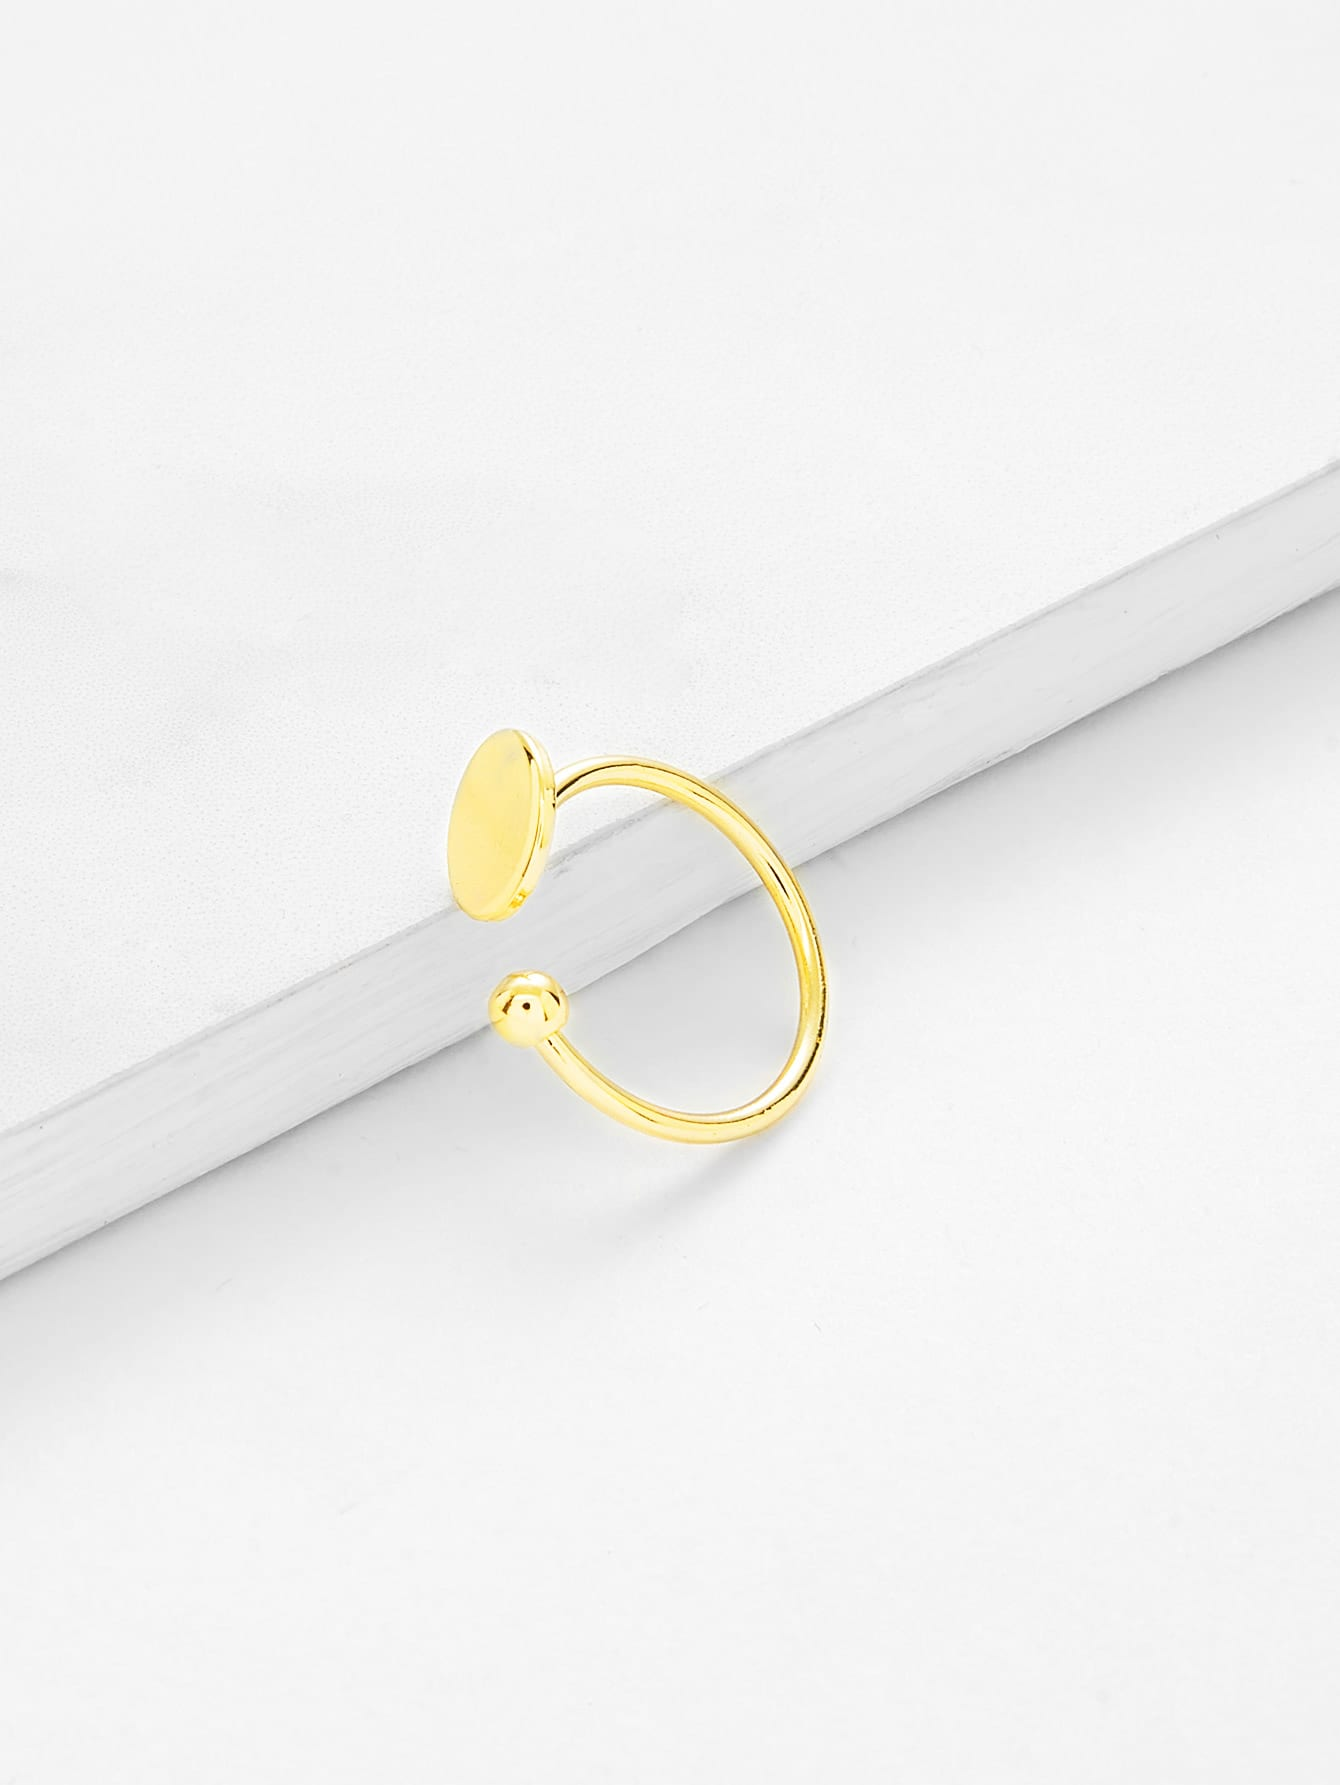 Round Design Open Ring open heart design ring